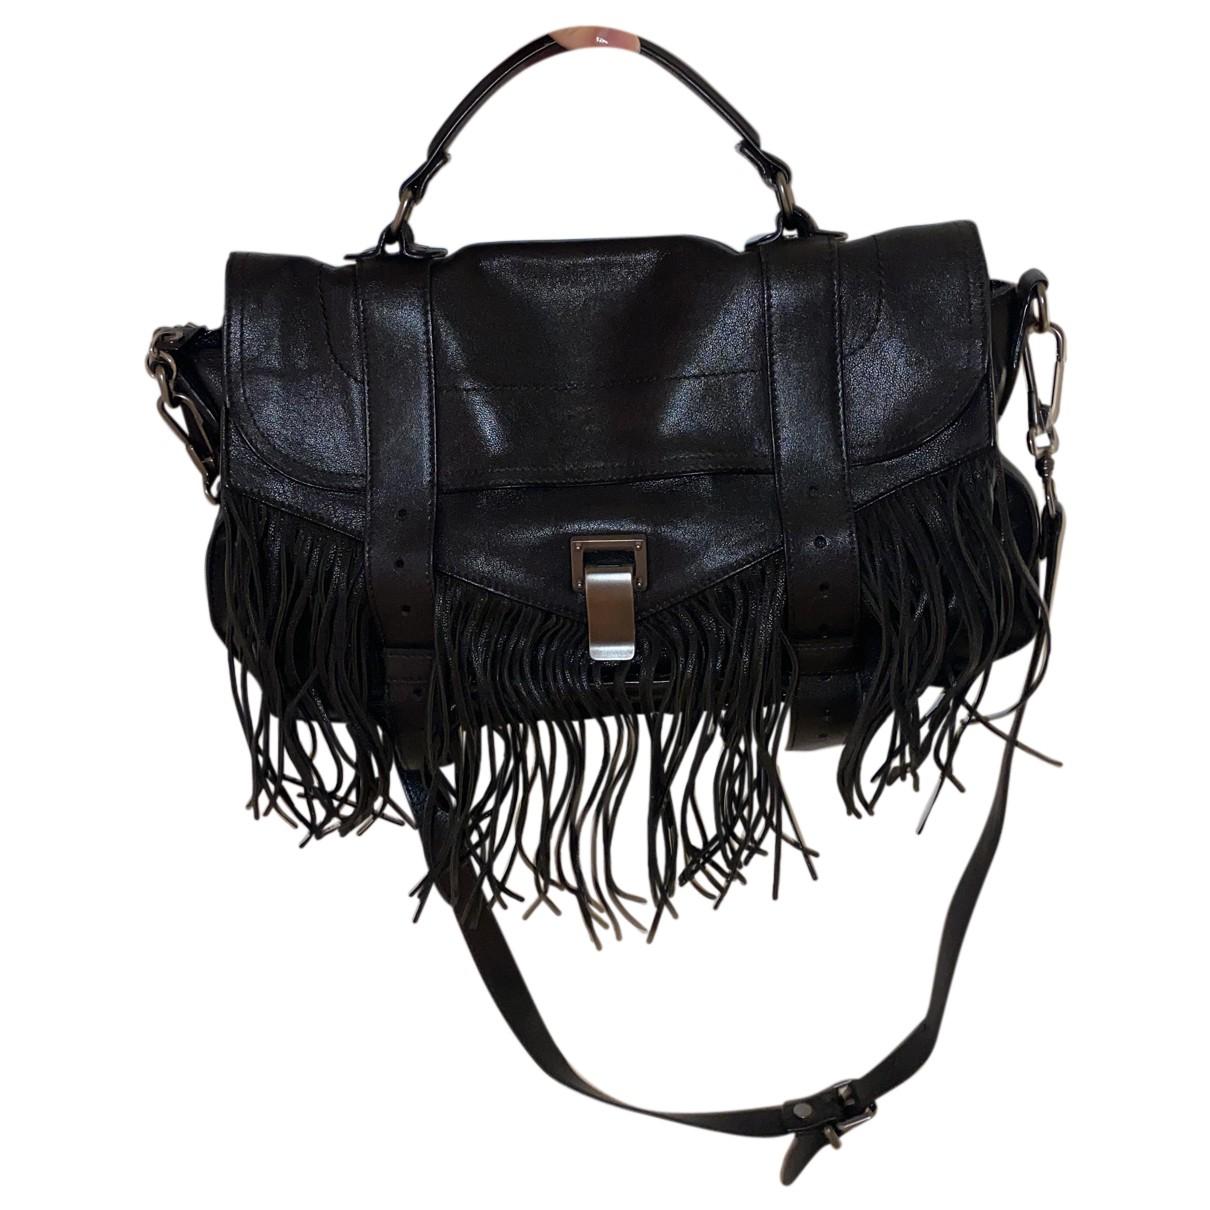 Proenza Schouler PS1 Black Leather handbag for Women N